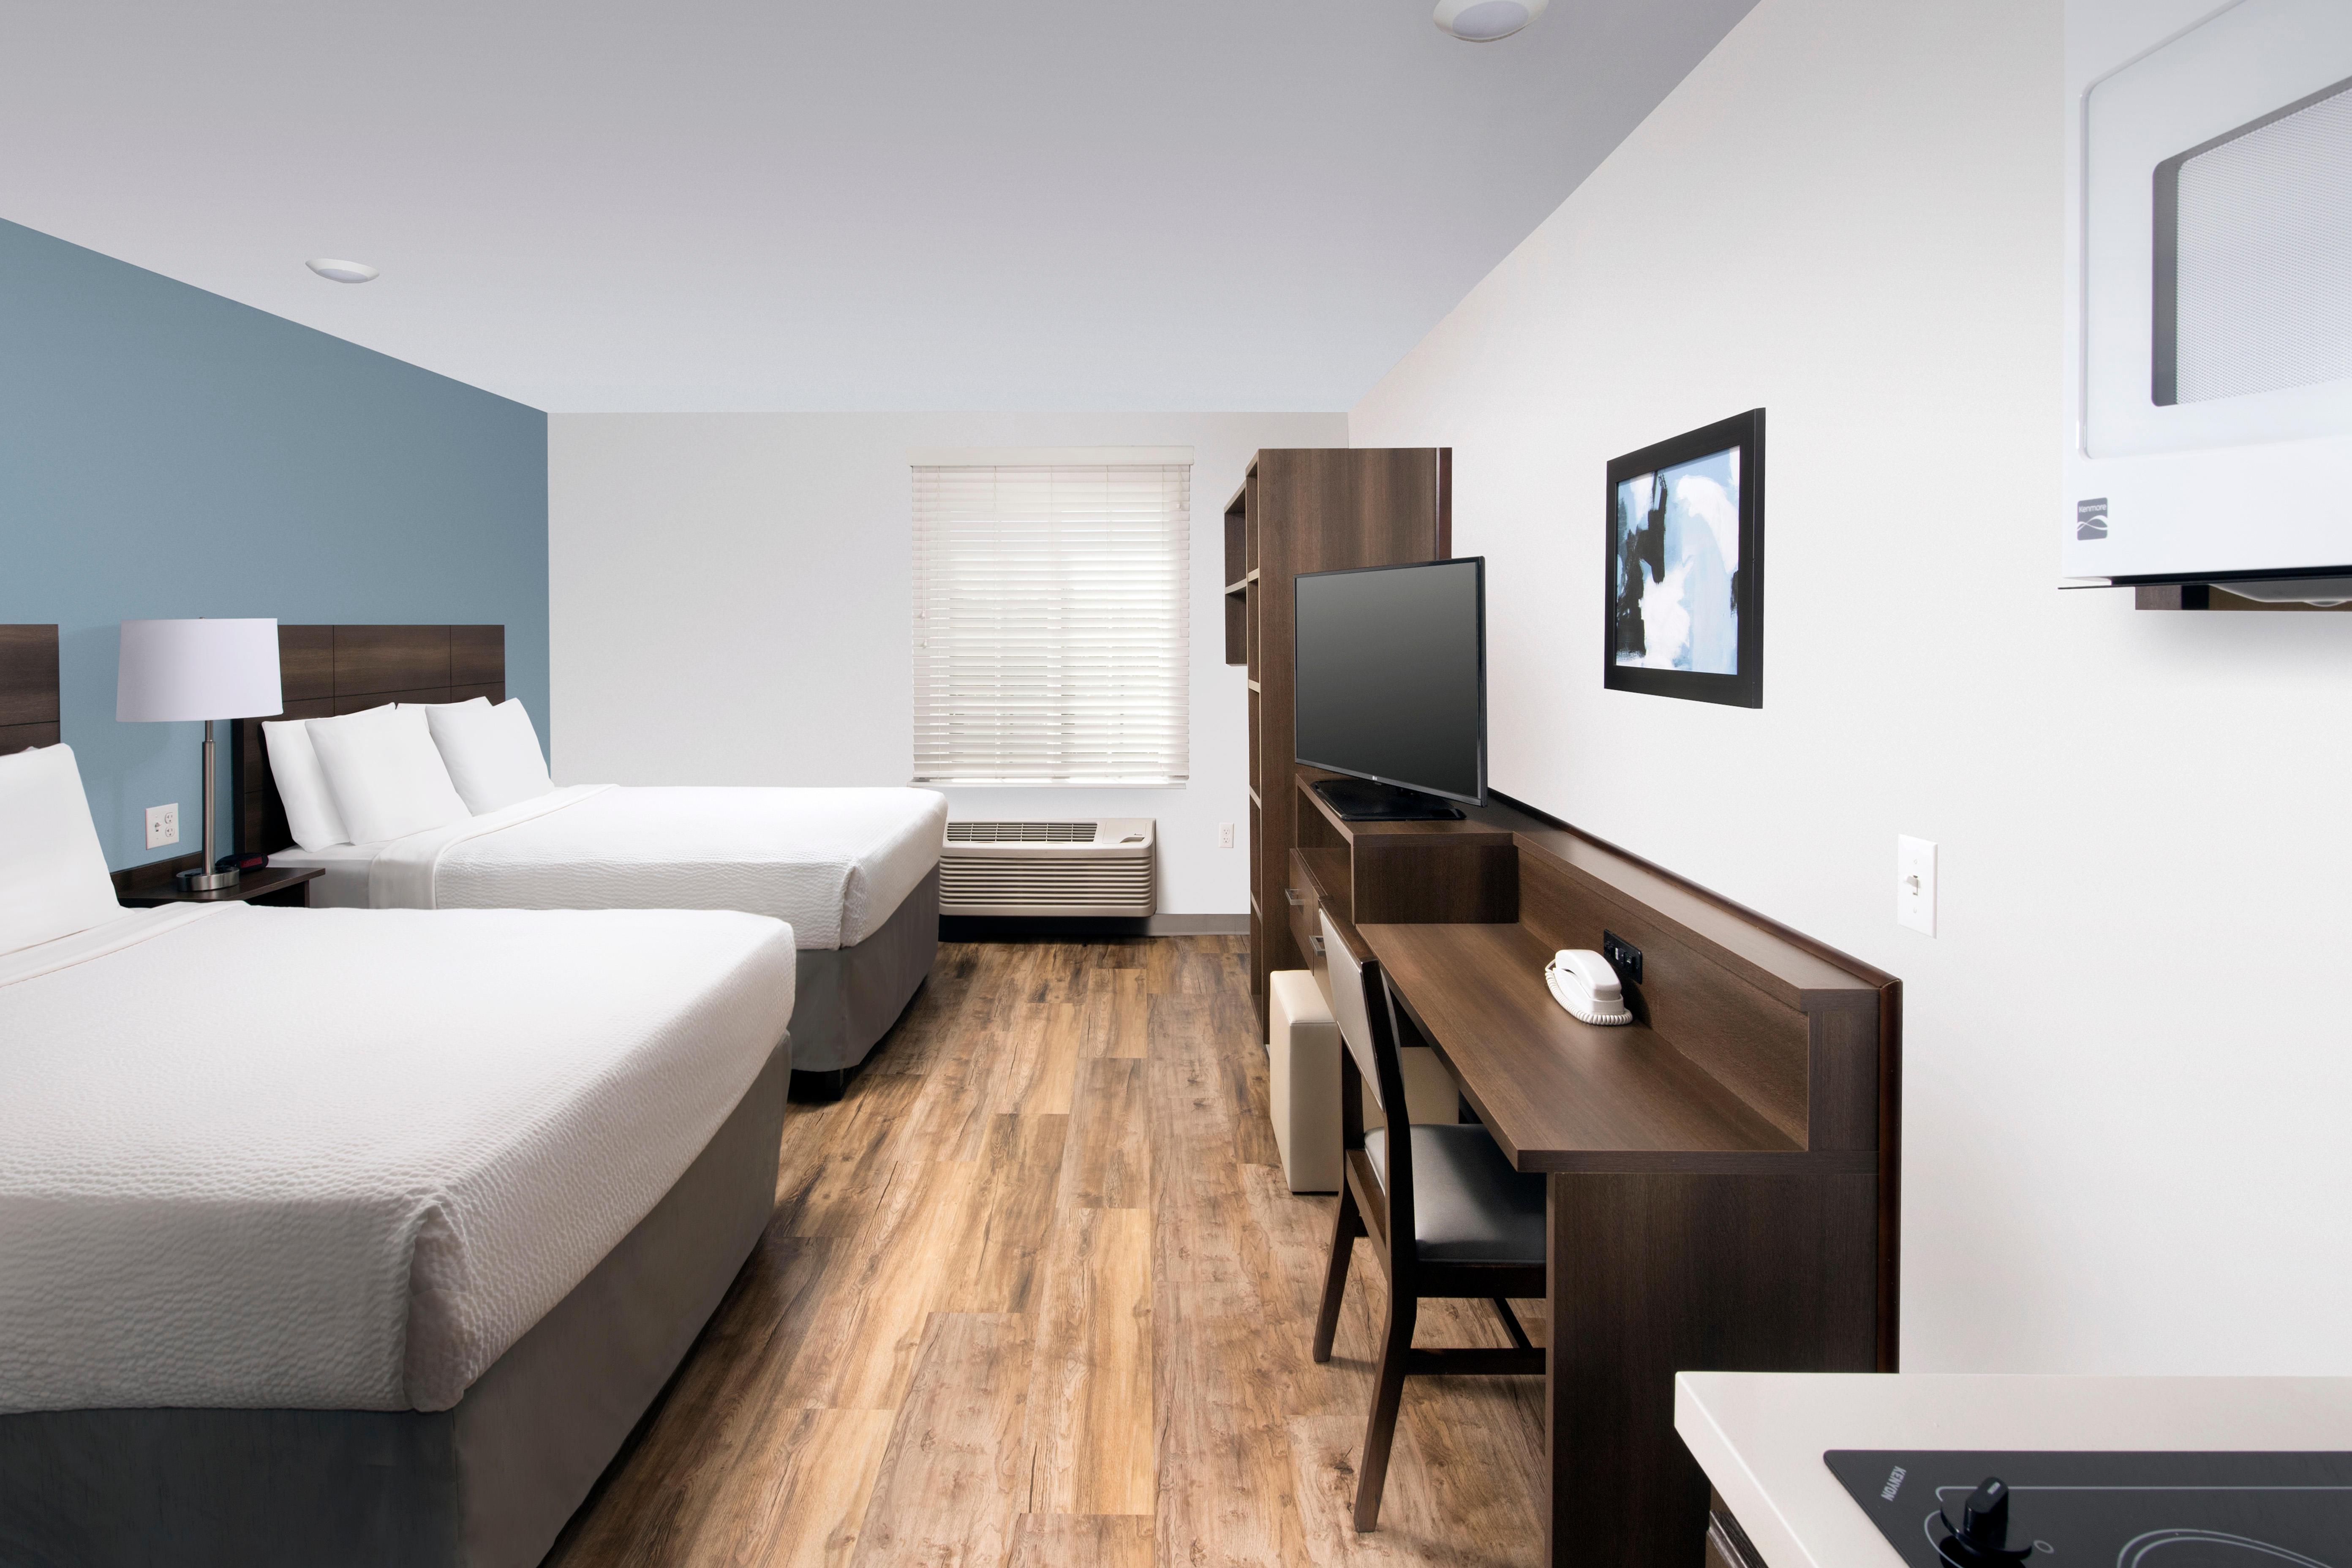 WoodSpring Suites Clearwater image 10